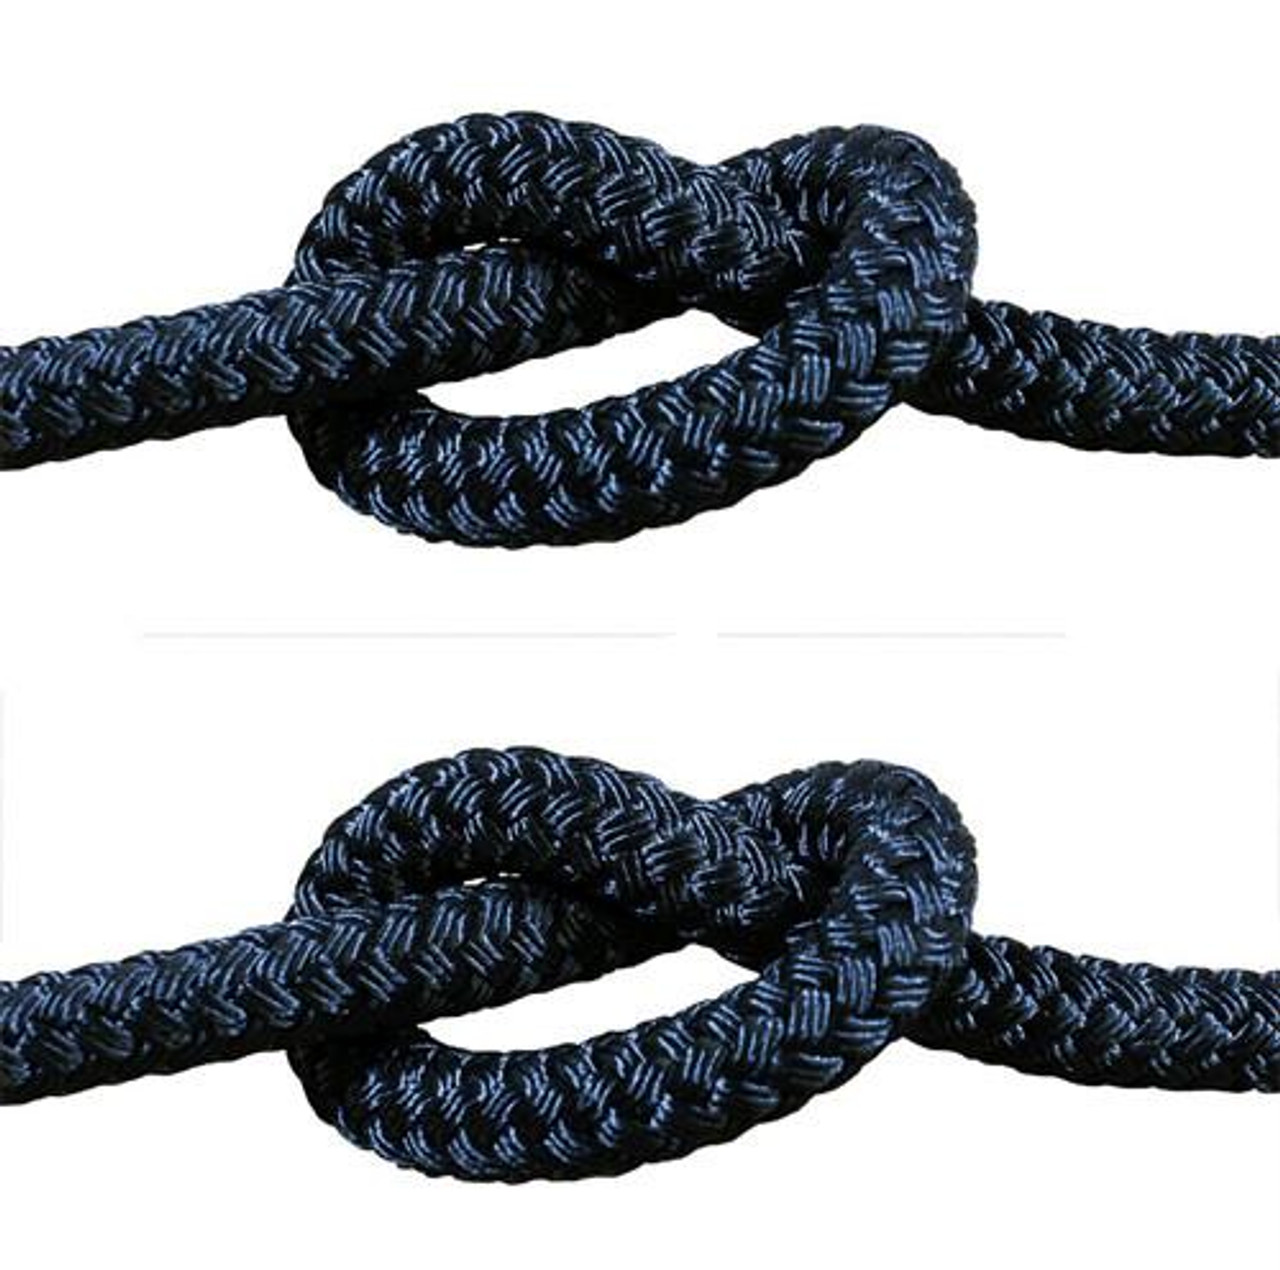 Rope - Double Braid Black 12mm x 1metre